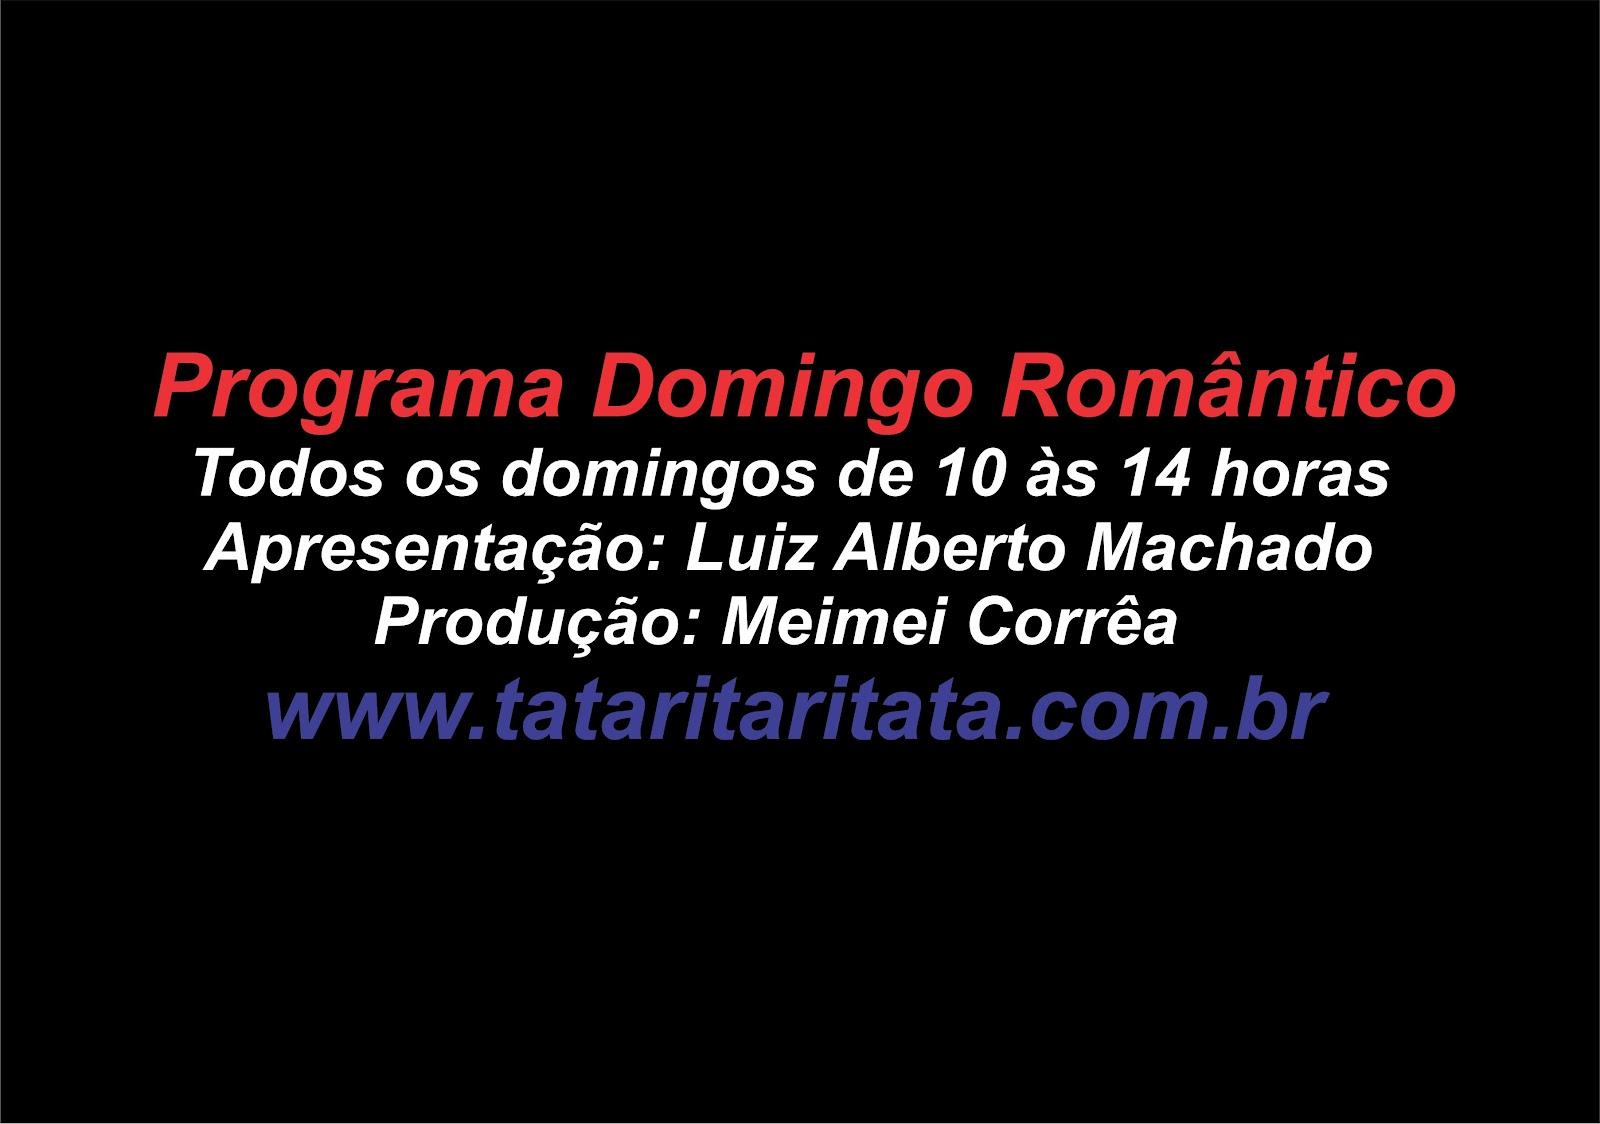 Caetano Veloso - Irene / Carolina / Os Argonautas / Chuvas De Verao